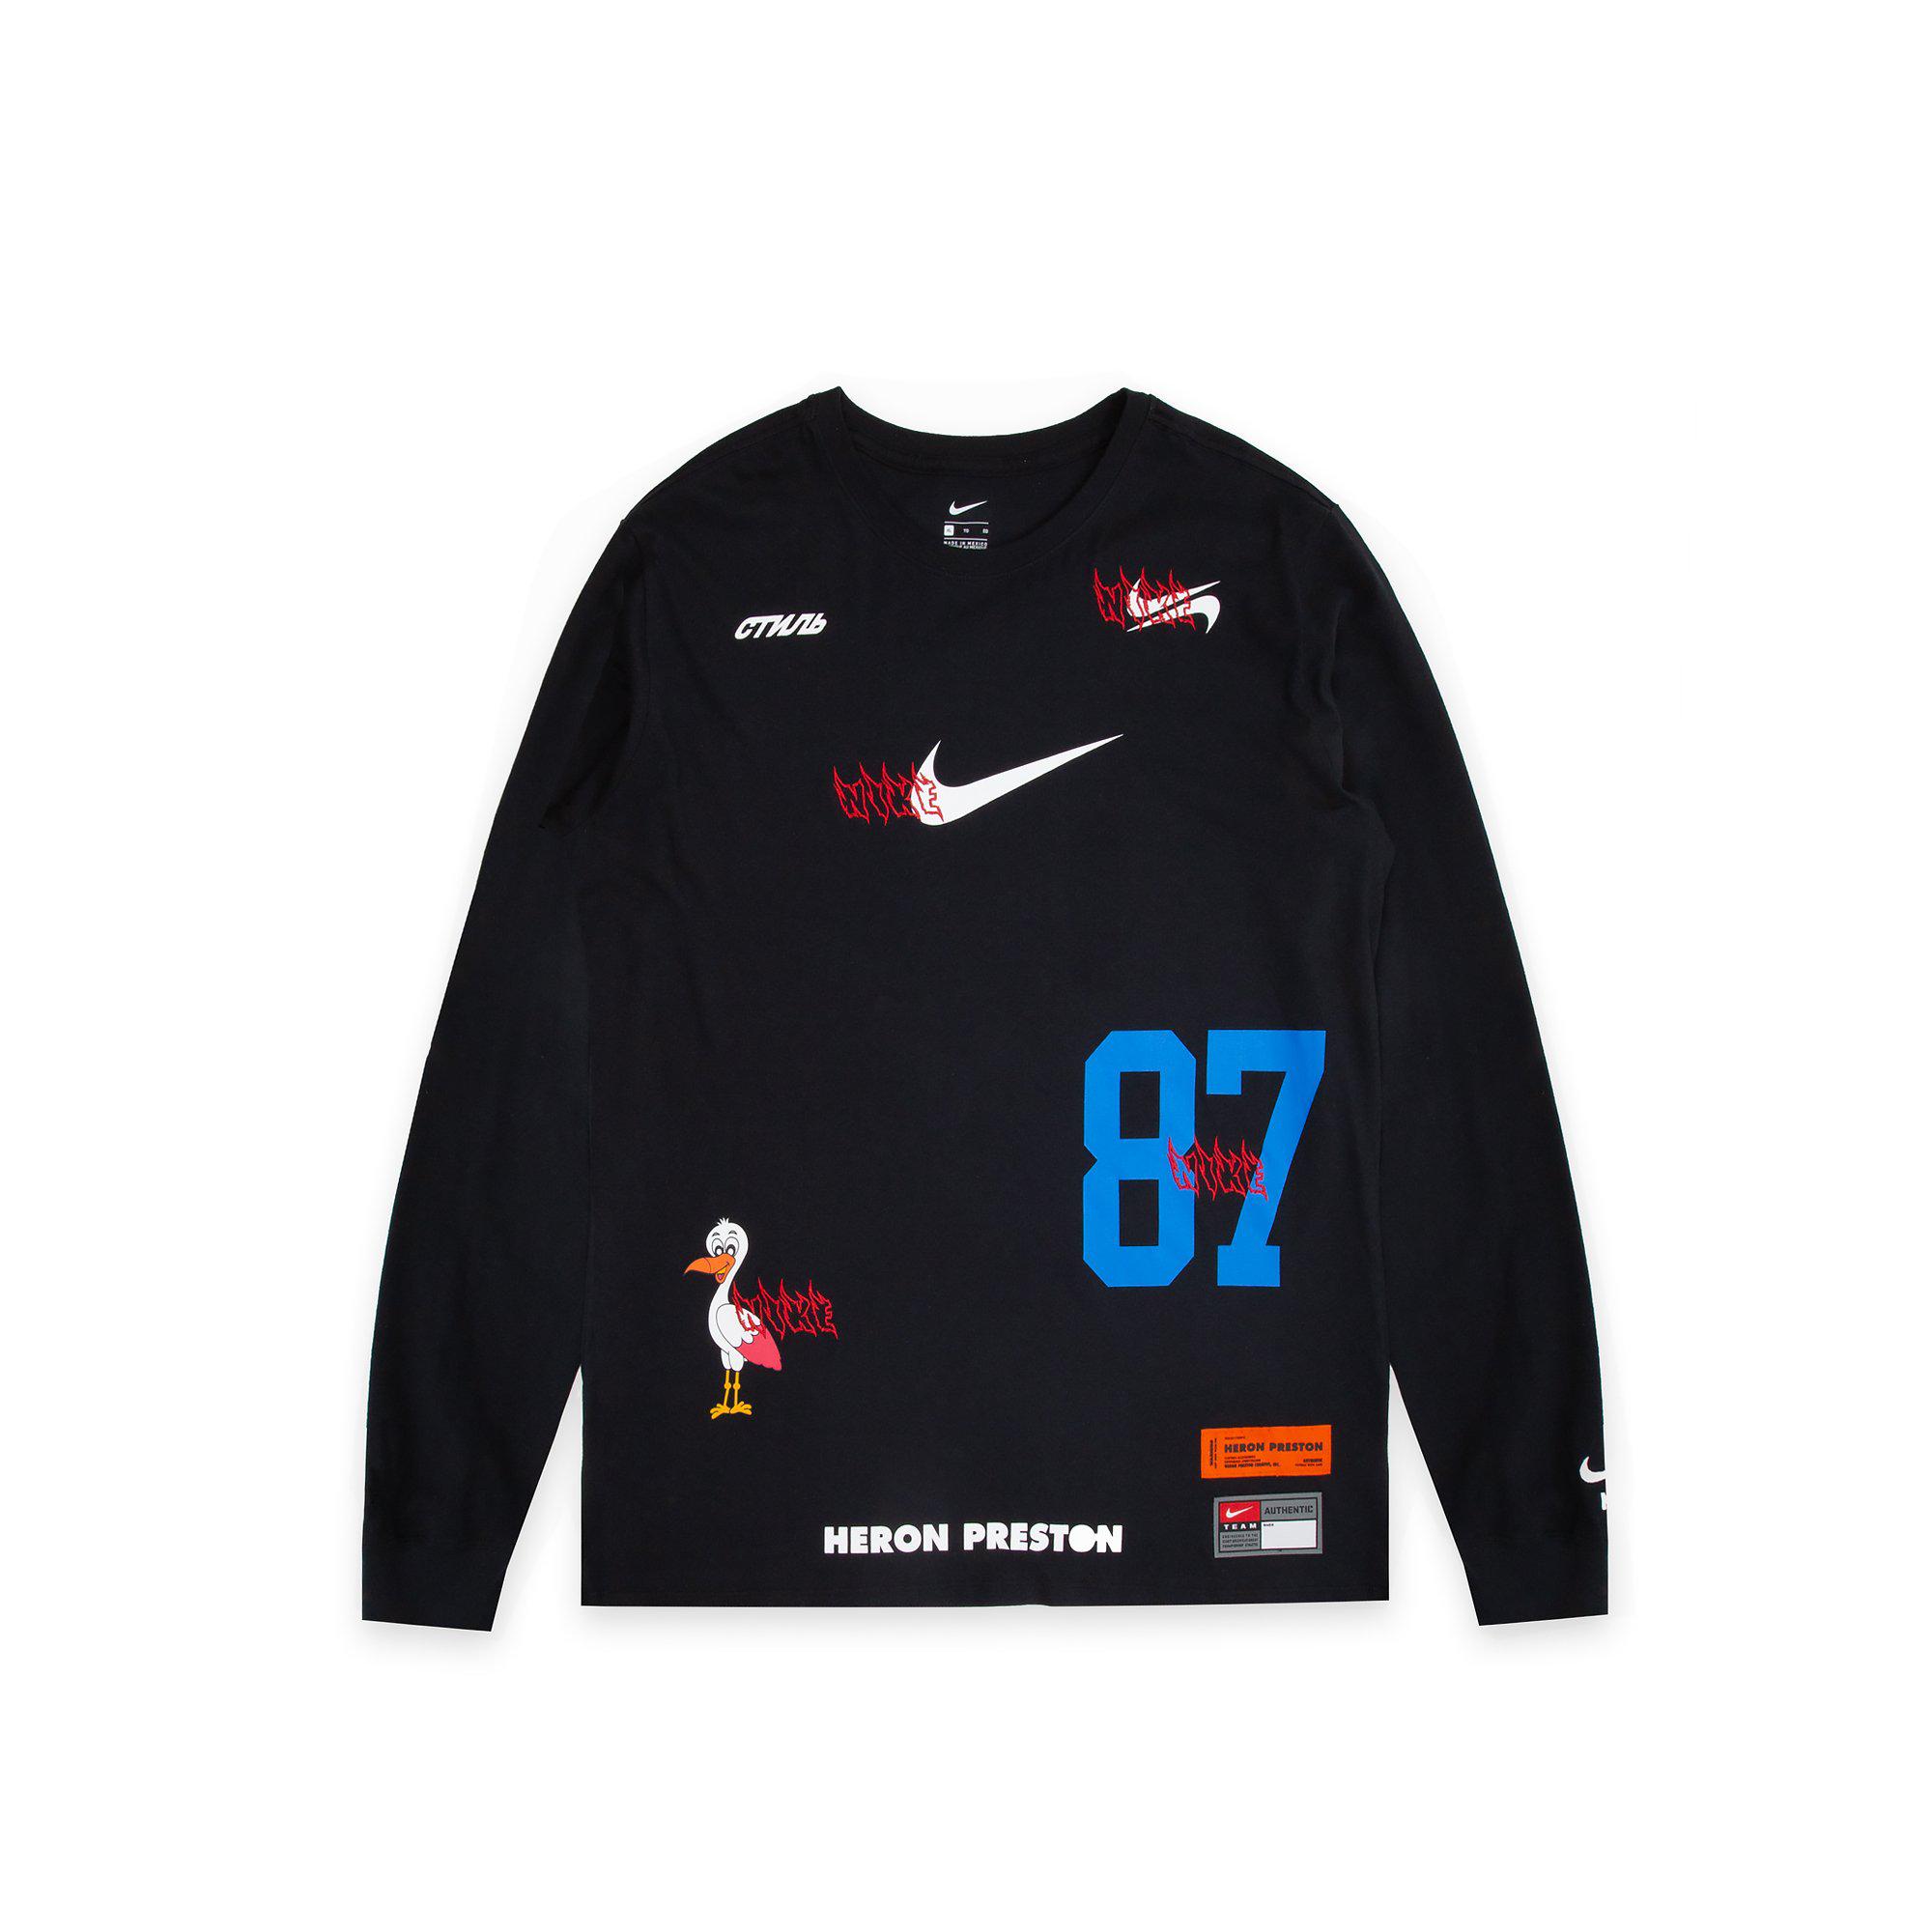 Nike x Heron Preston L/S Tee Black - SS19